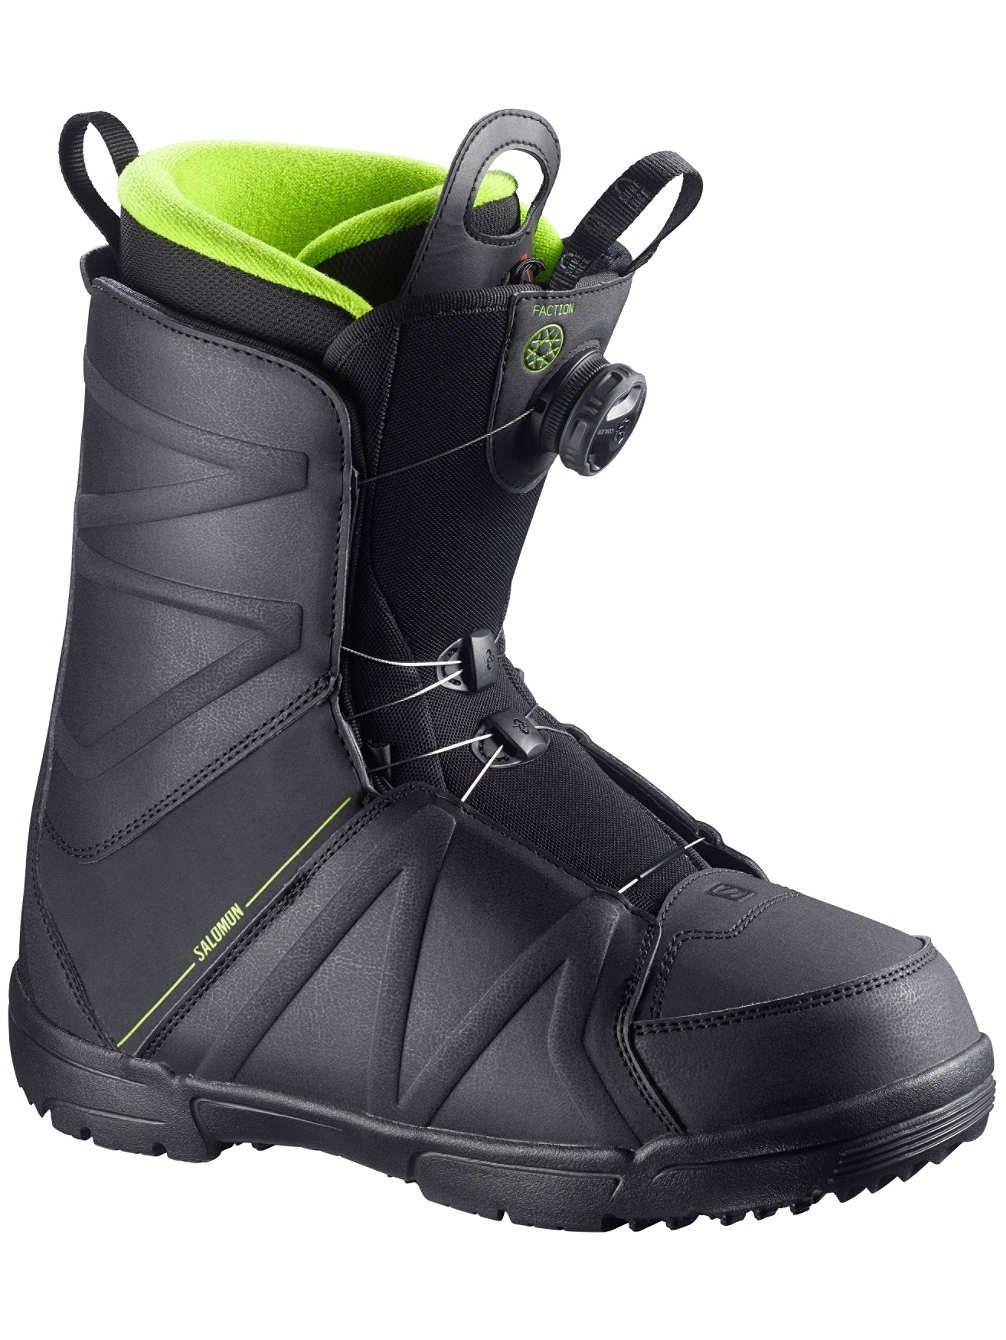 000Blackblackblack SnowboardL37566700 Chaussures Chaussures Chaussures Salomon Salomon SnowboardL37566700 De Salomon SnowboardL37566700 000Blackblackblack De De FJTK1lc